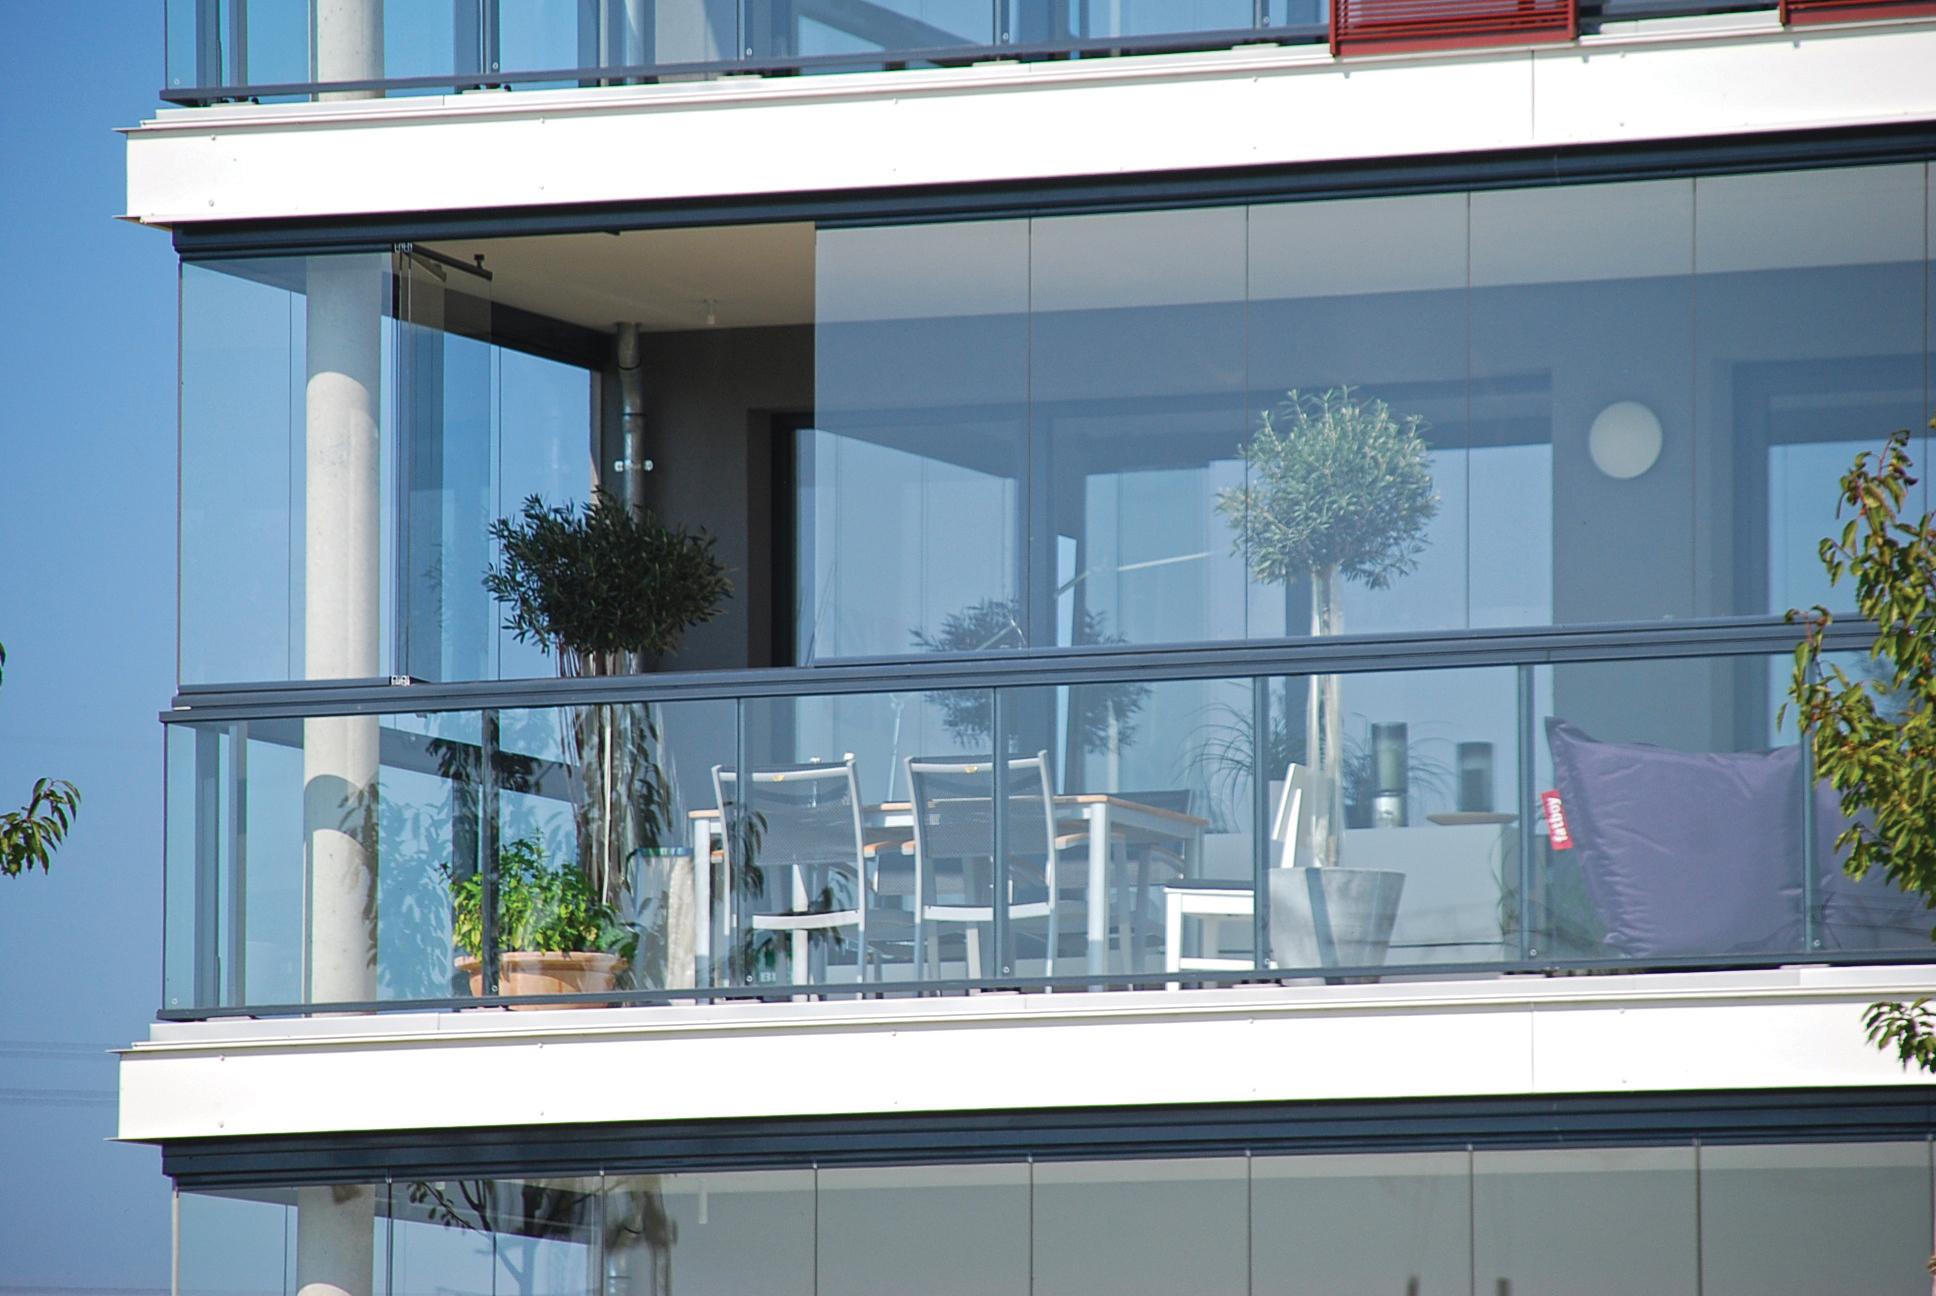 Cam Balkonlar Neden Popüler Oldu?